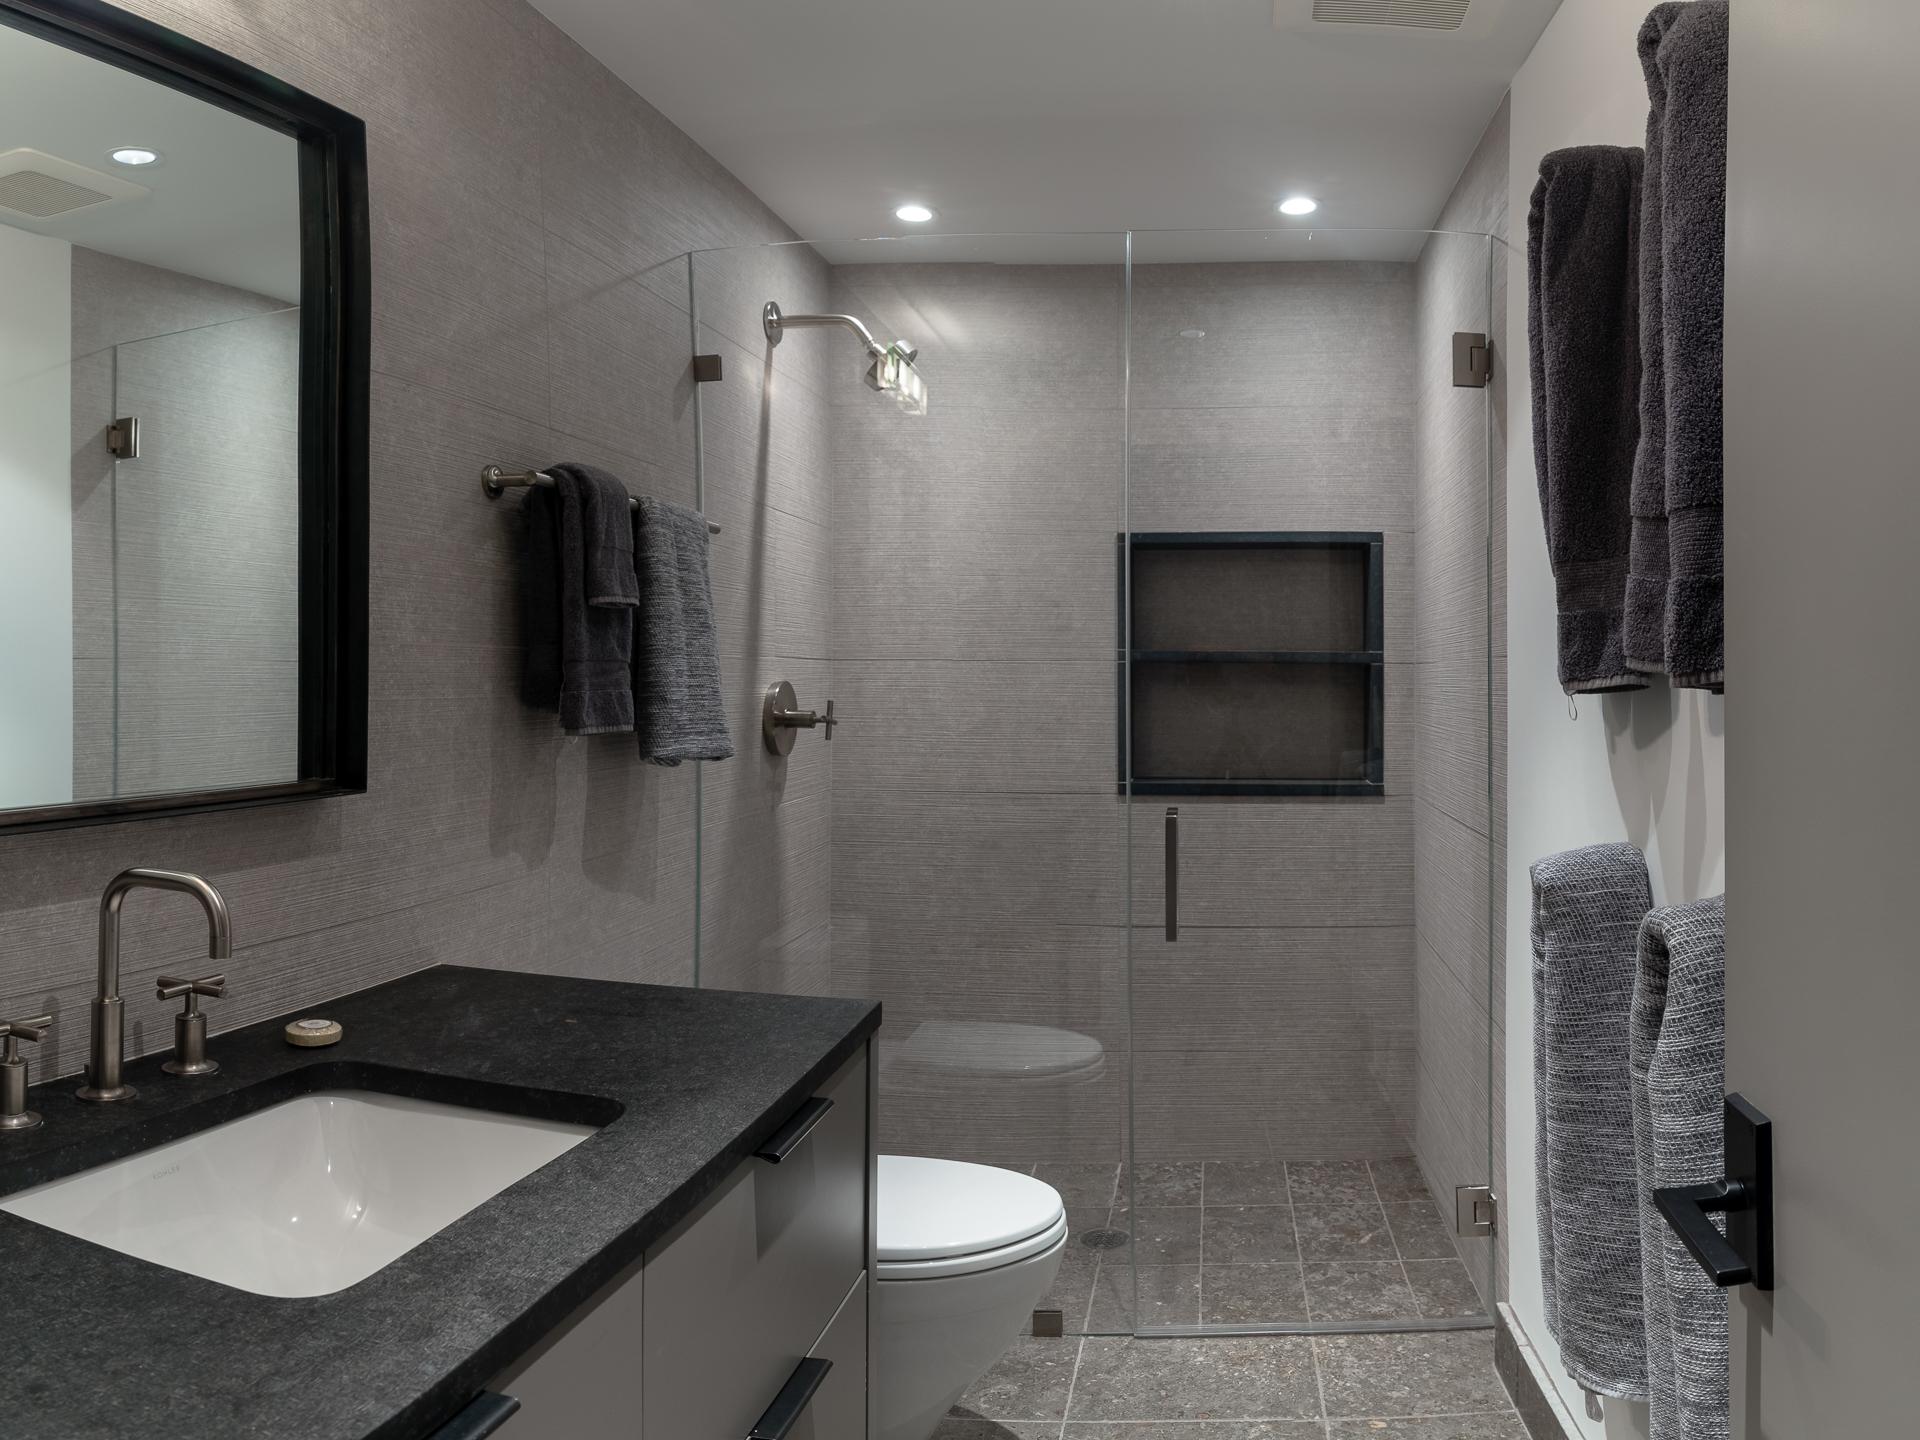 27_Bathroom 3.jpg